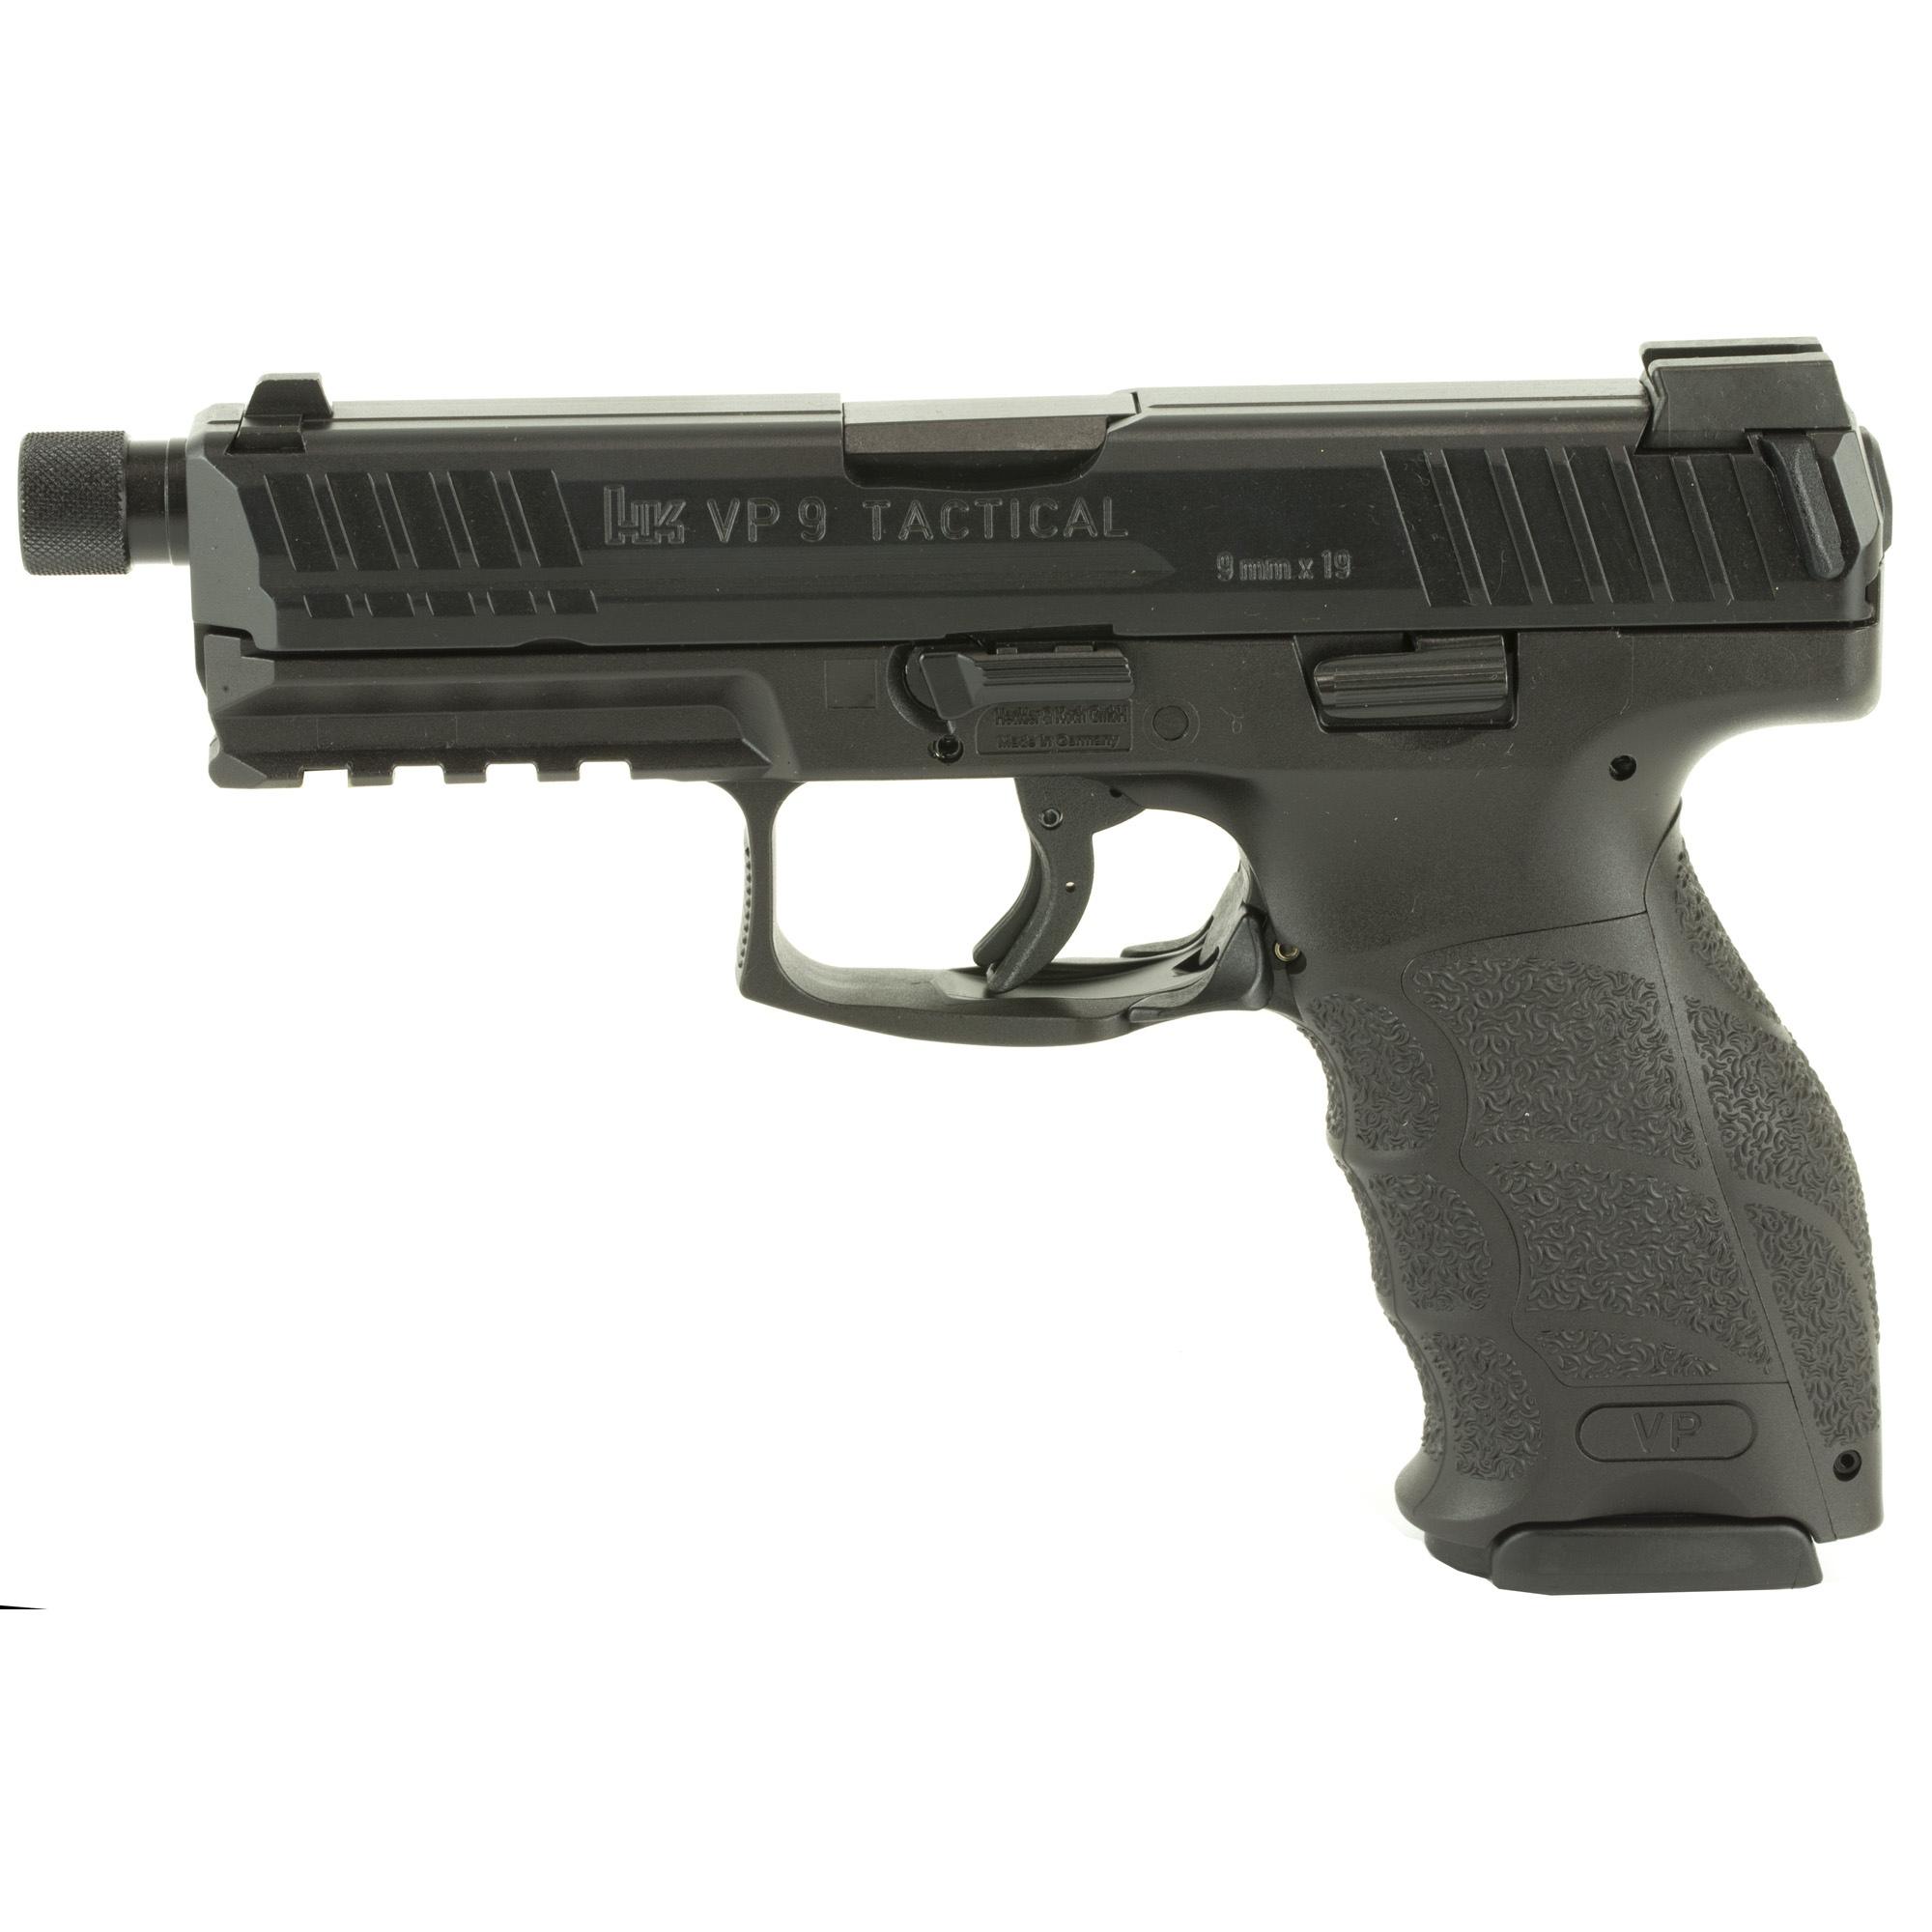 HK VP9 LE 9mm Threaded Barrel Black · 700009TLE-A5 · DK